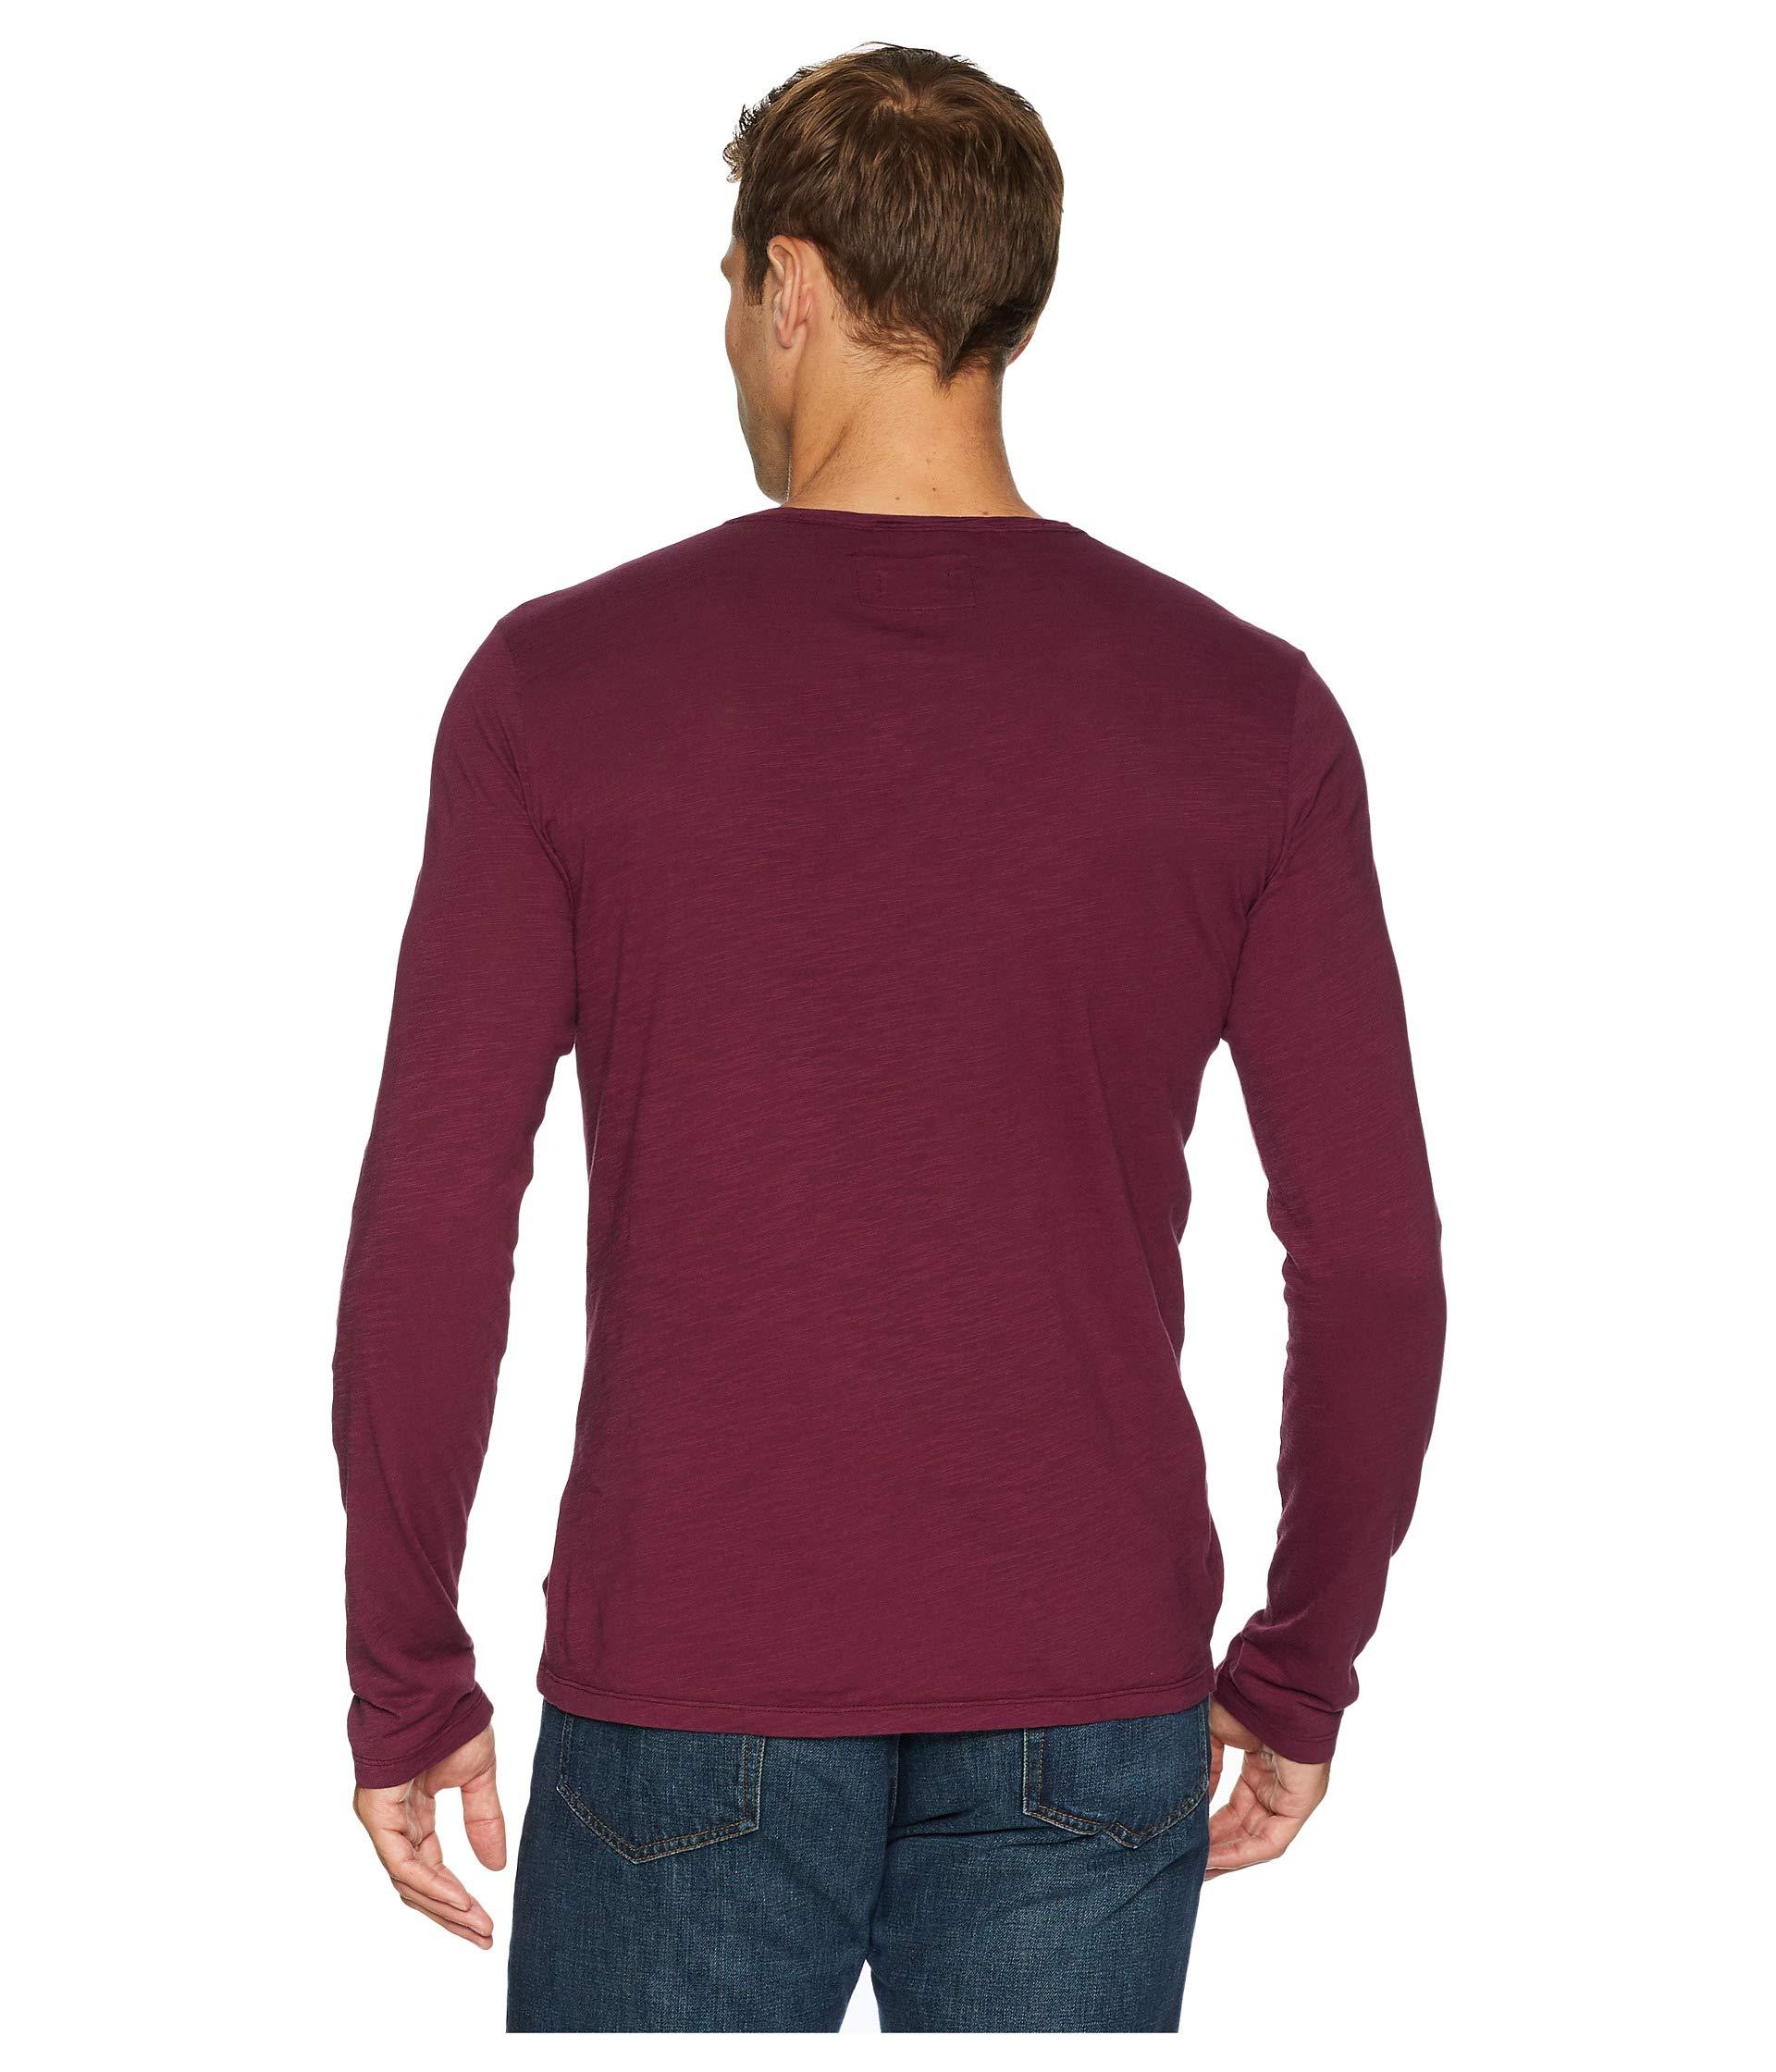 Carillo Mulberry doc o V Notch Les Jersey Sleeve Slub Long Mod neck tqgw46x6